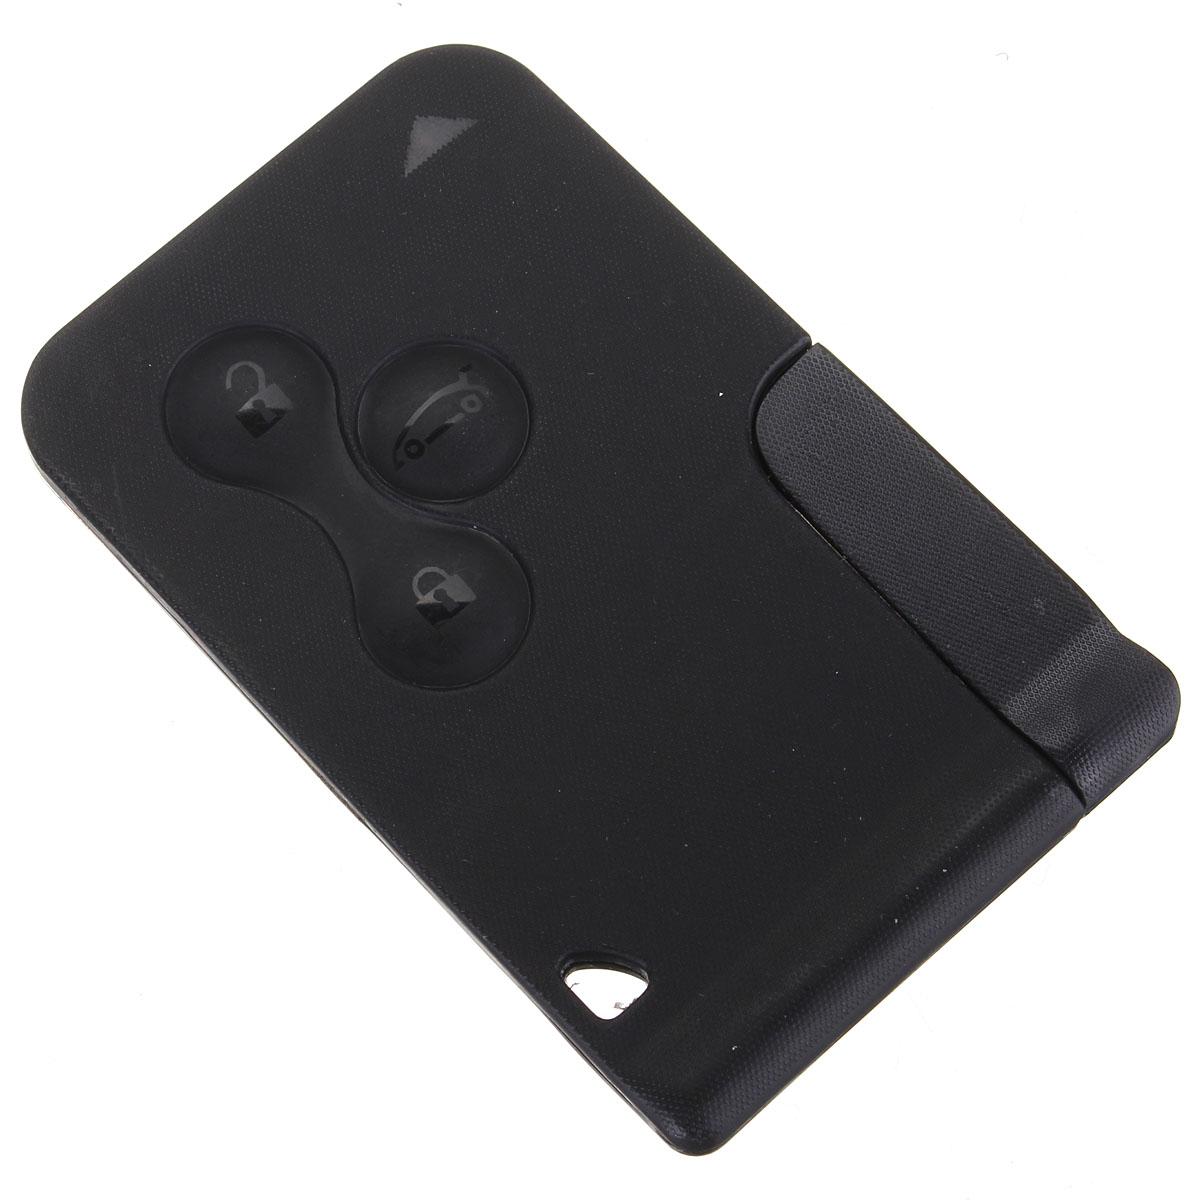 remote key case kit battery switch blade for renault clio megane grand scenic ebay. Black Bedroom Furniture Sets. Home Design Ideas